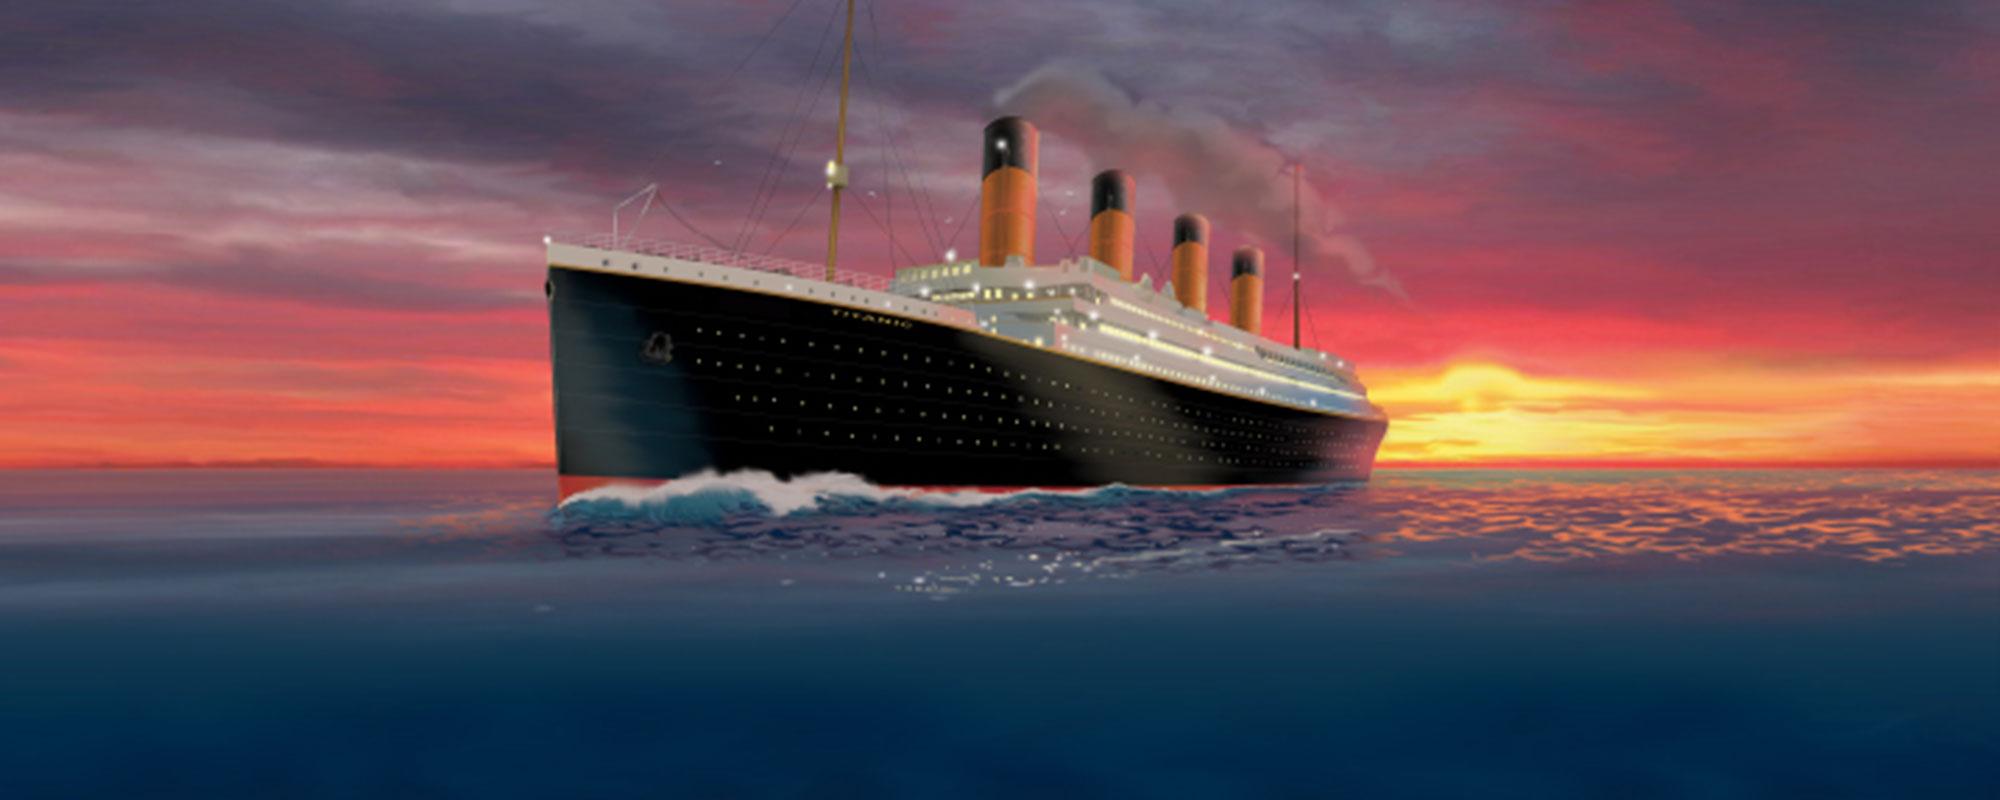 Titanic Artifact Exhibition attraction